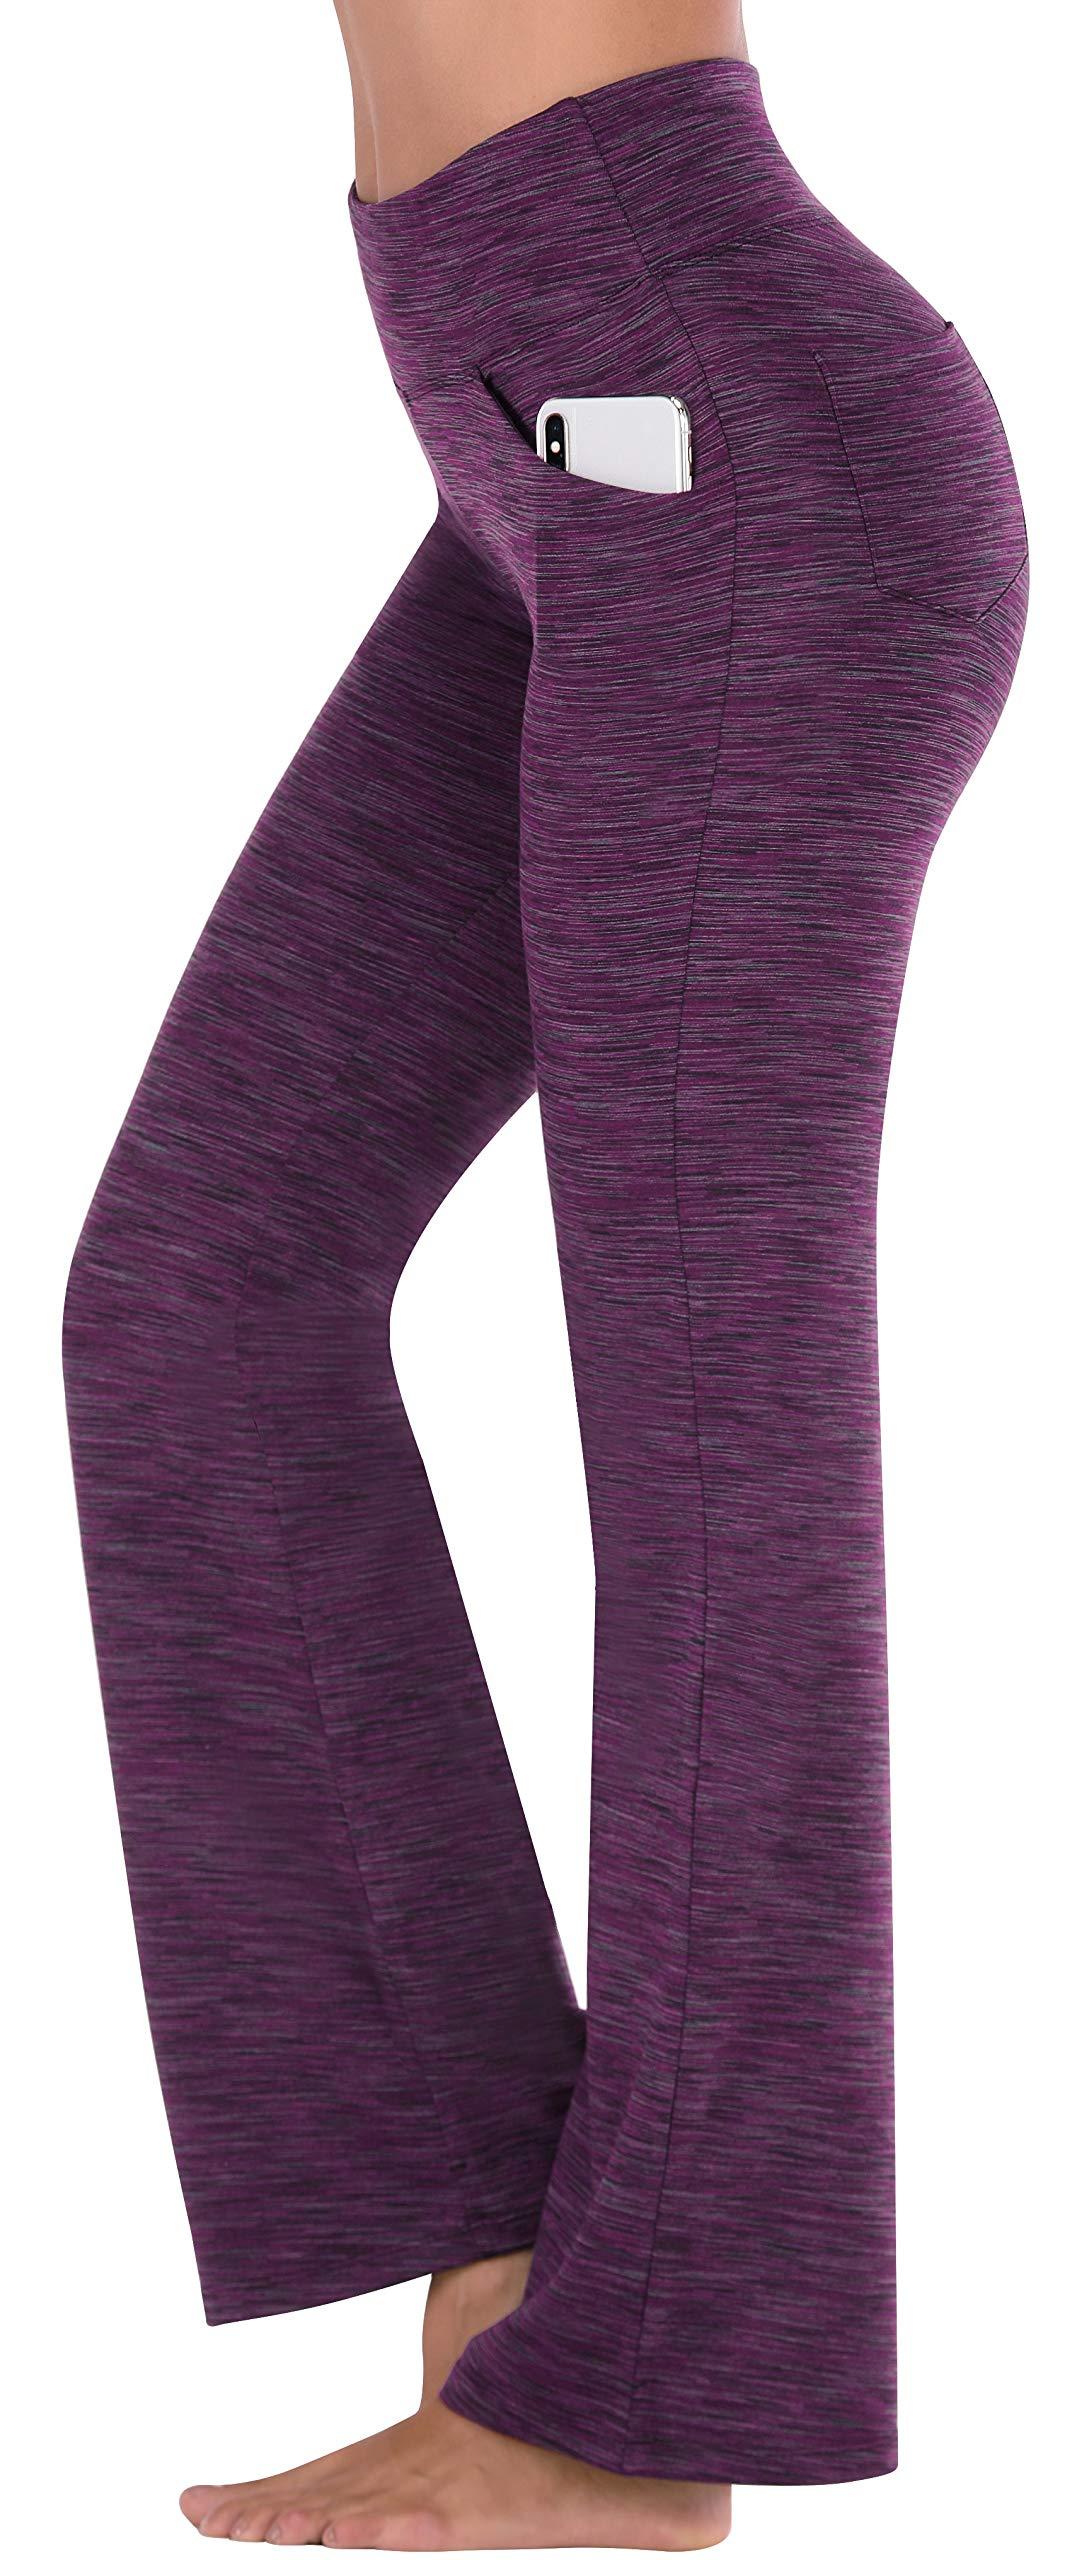 IUGA Bootcut Yoga Pants with Pockets for Women High Waist Workout Bootleg Pants Tummy Control, 4 Pockets Work Pants for Women (Space ZISE, Large) by IUGA